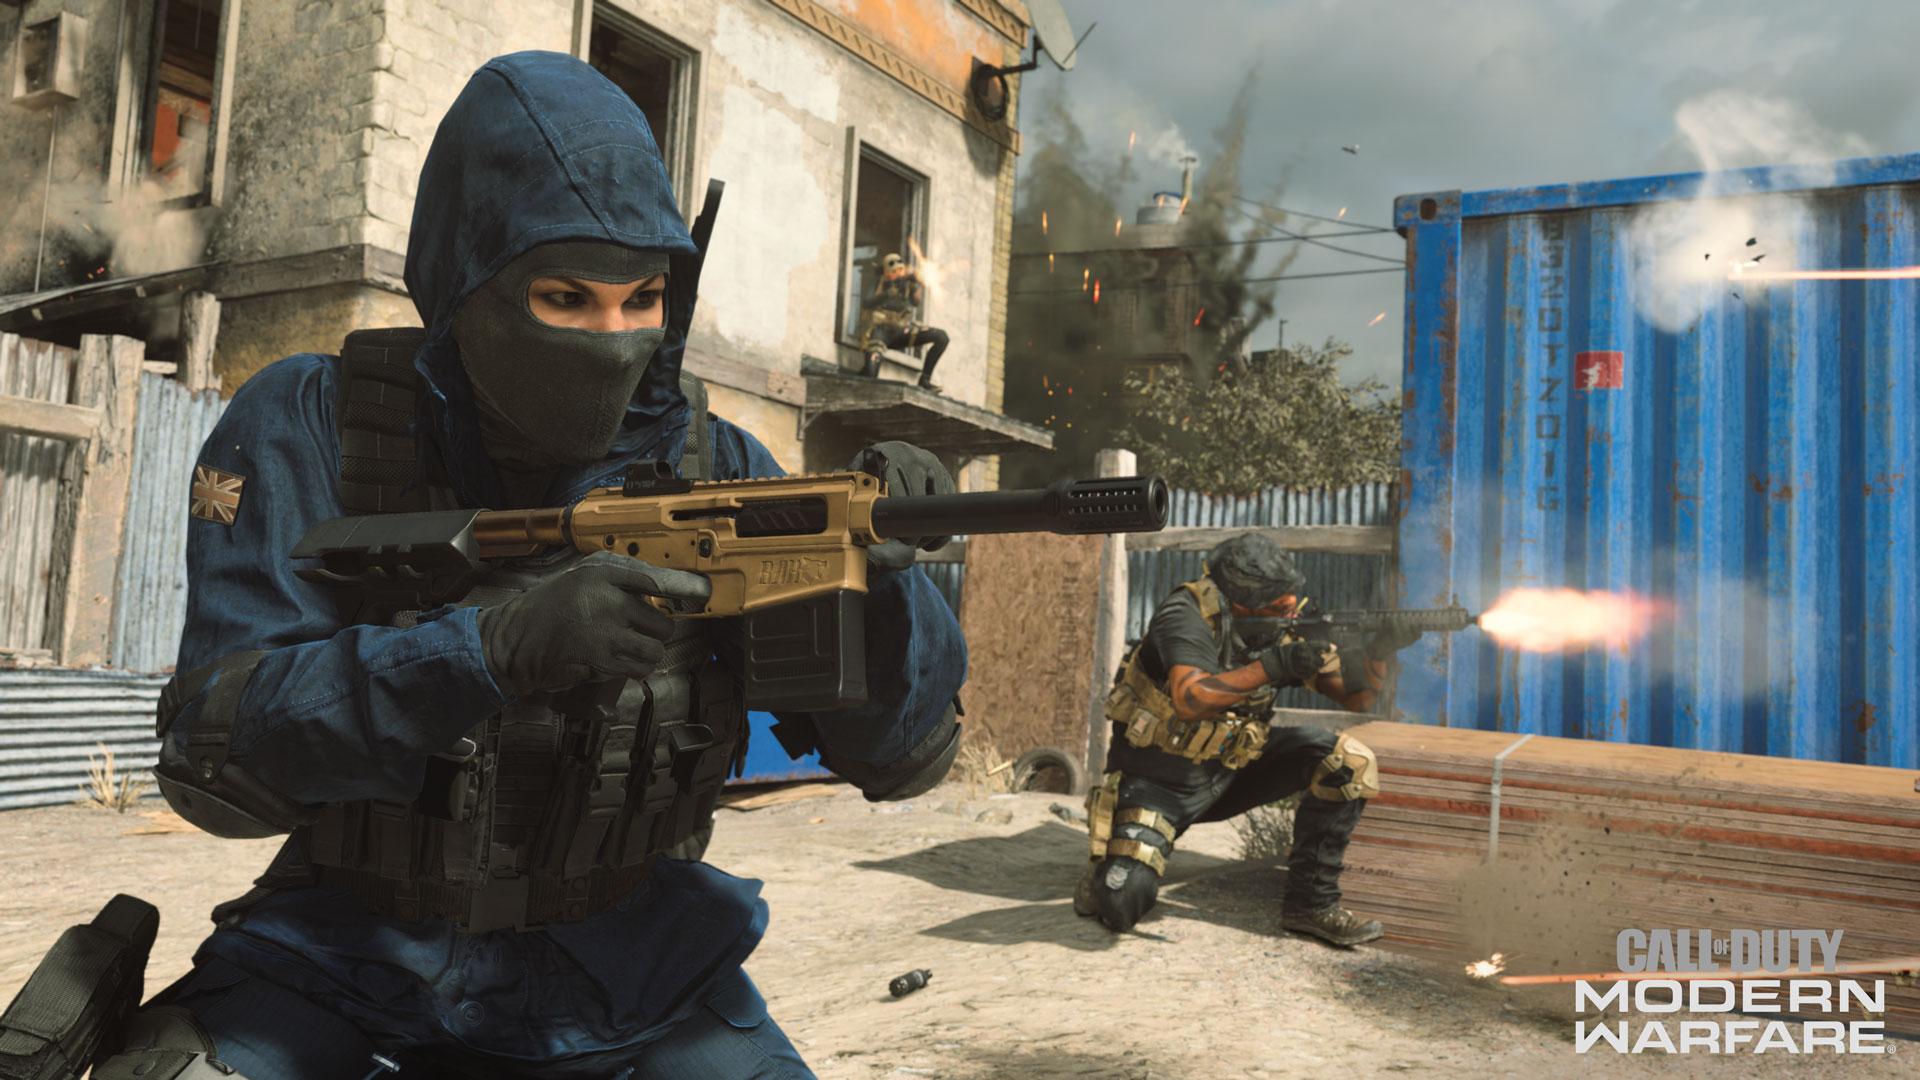 Modern Warfare New LMG Coming in Season 3 Gameplay Leaked